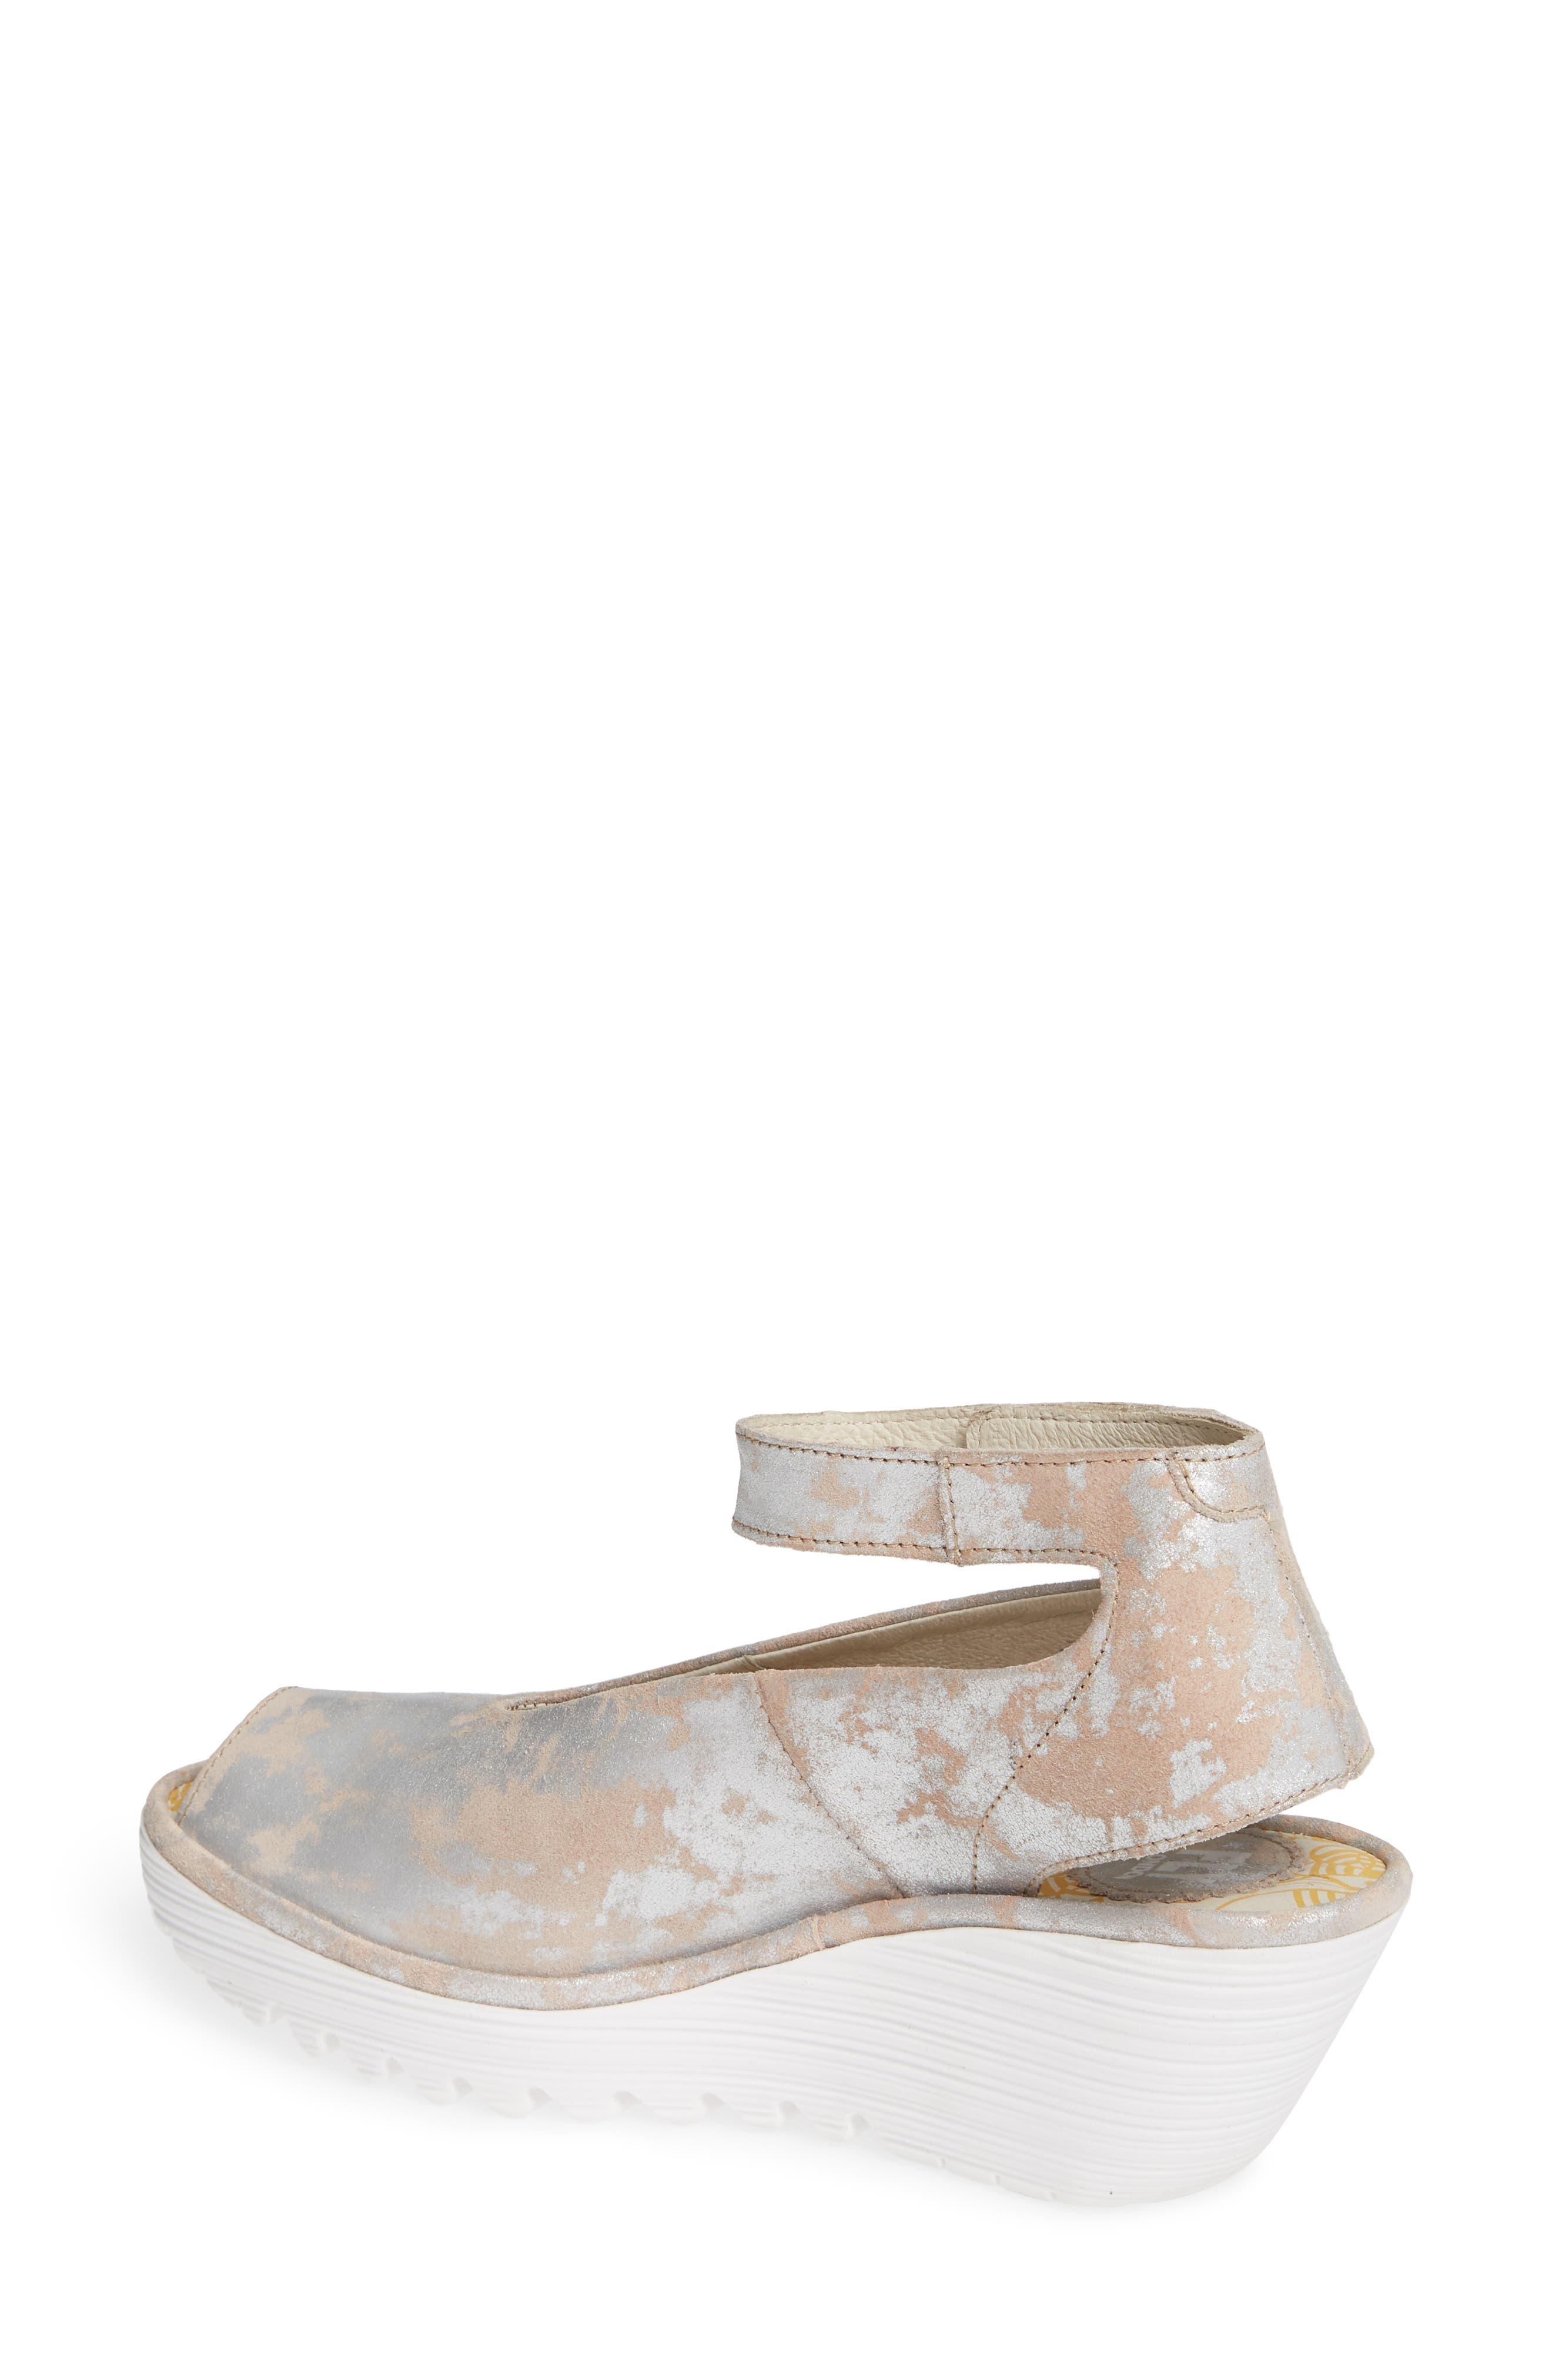 'Yala' Sandal,                             Alternate thumbnail 2, color,                             ROSE LEATHER